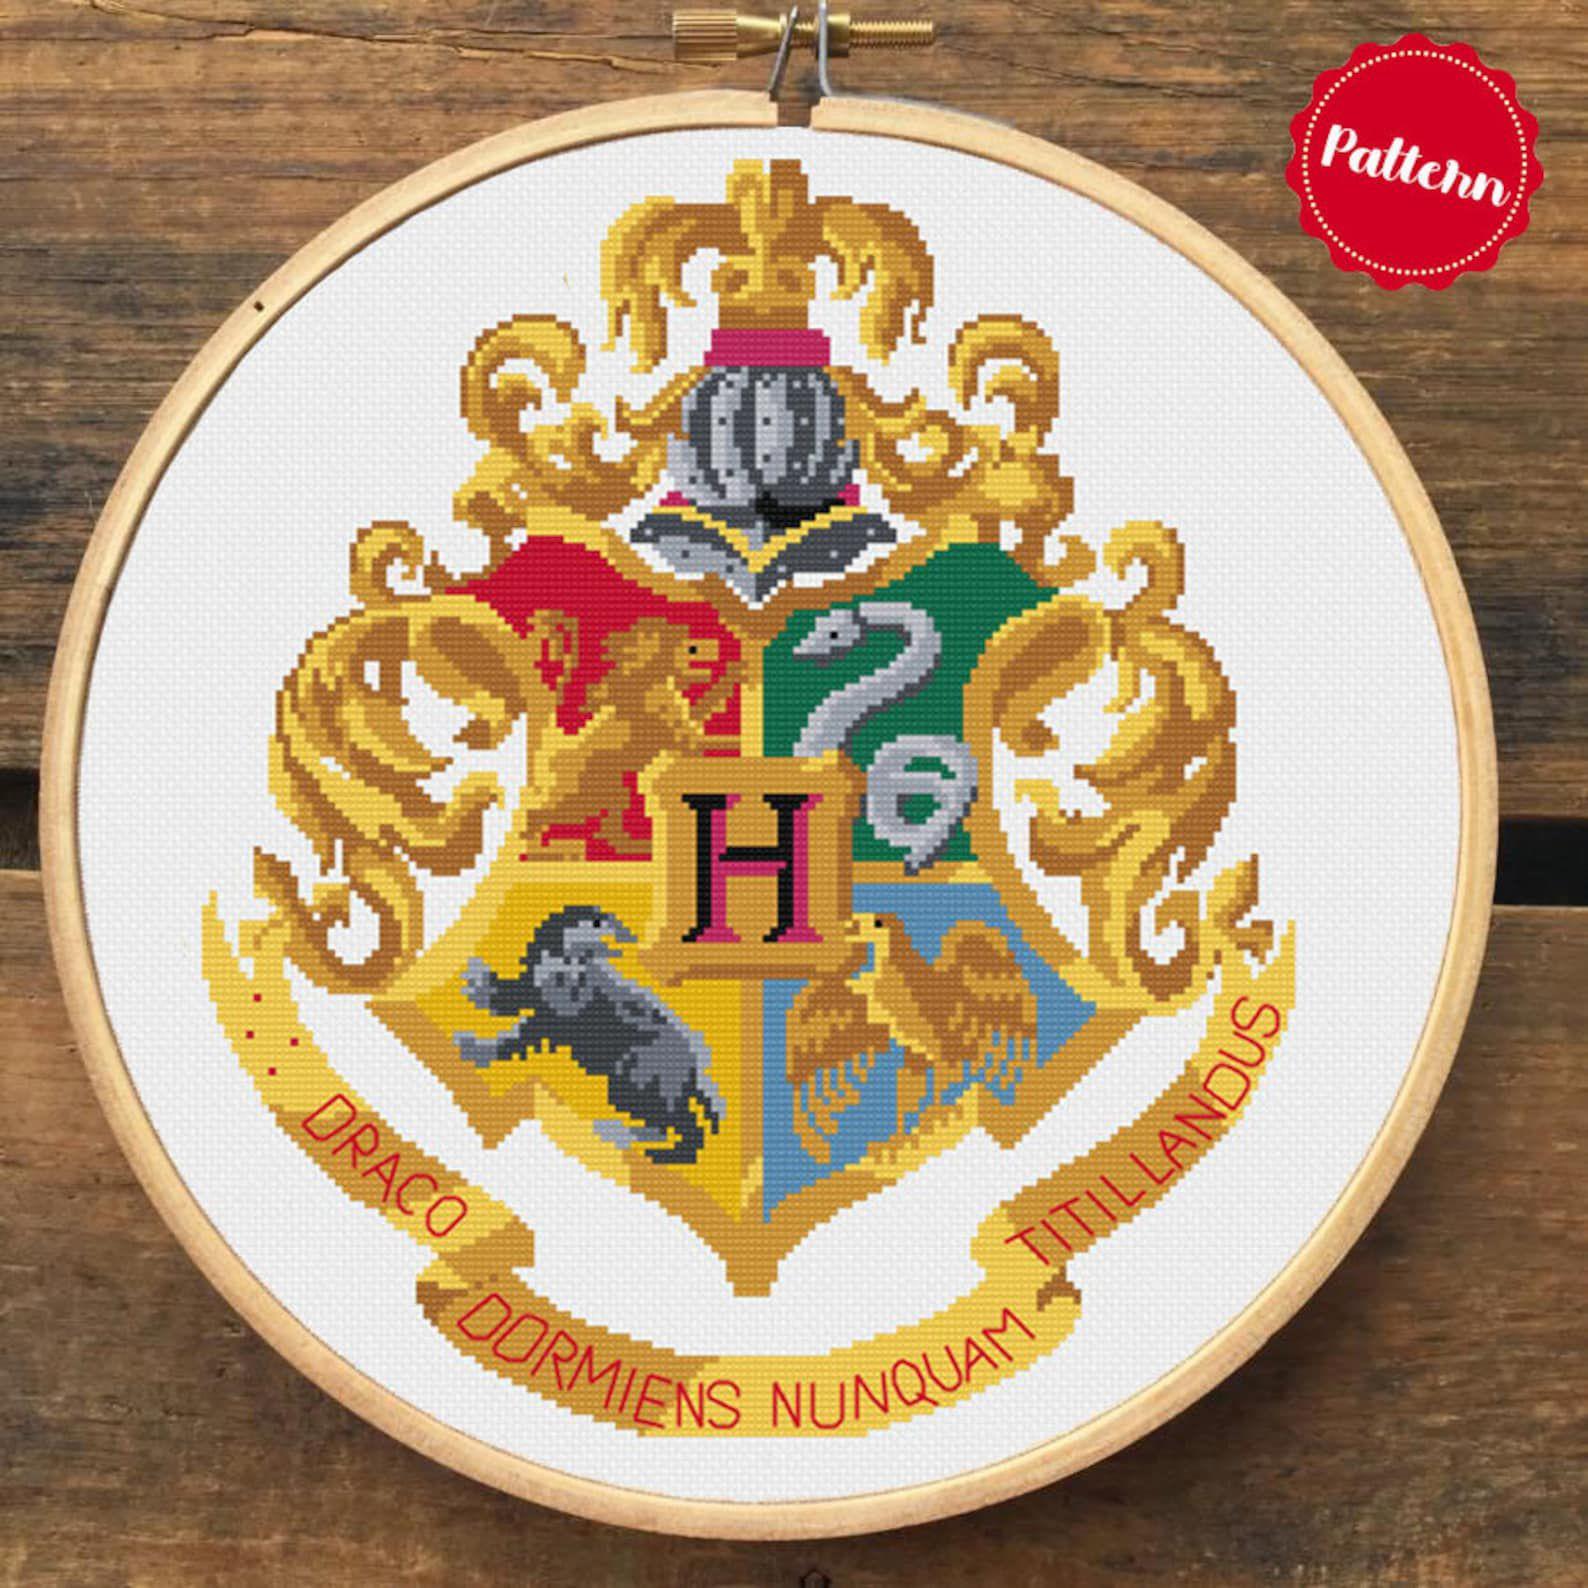 Hogwarts cross-stitch pattern